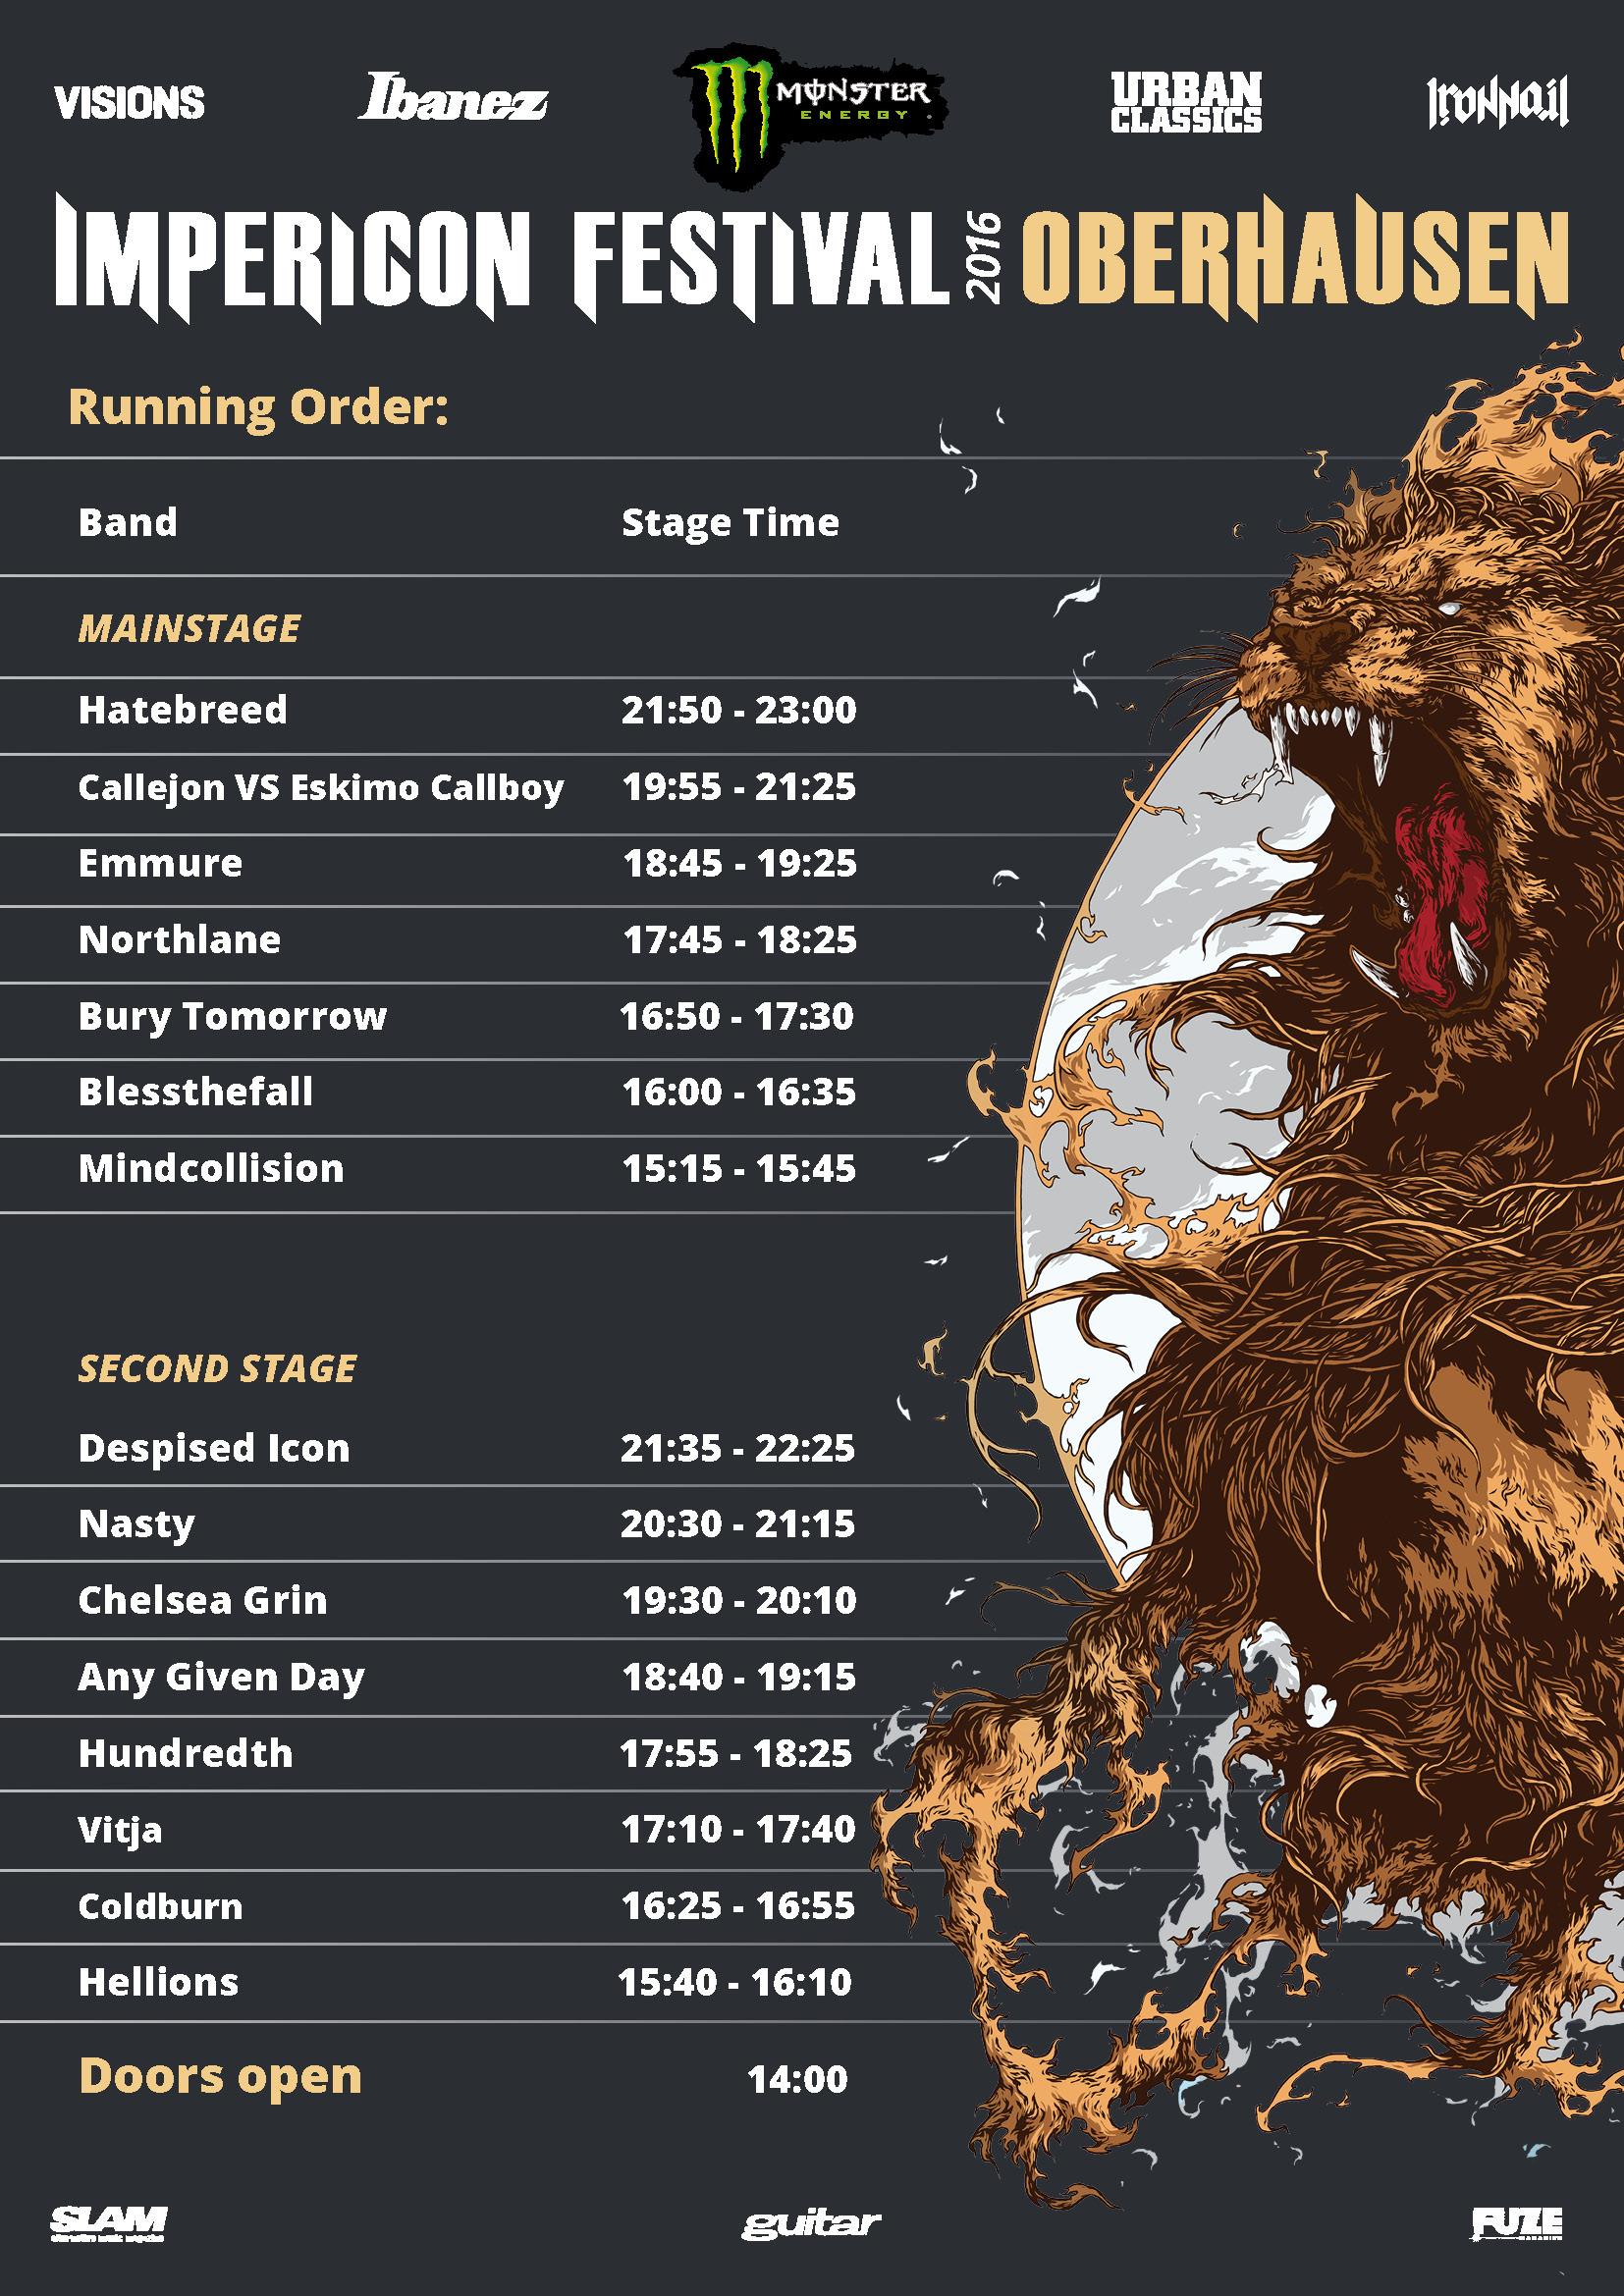 Running Order Impericon Festivals Oberhausen